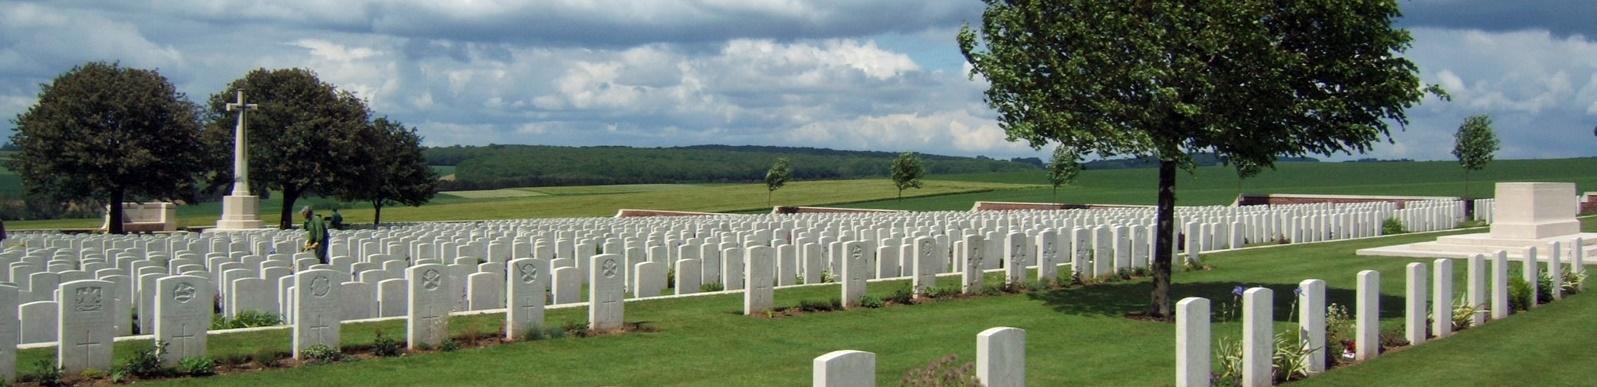 Dantzig Alley British Cemetery, France